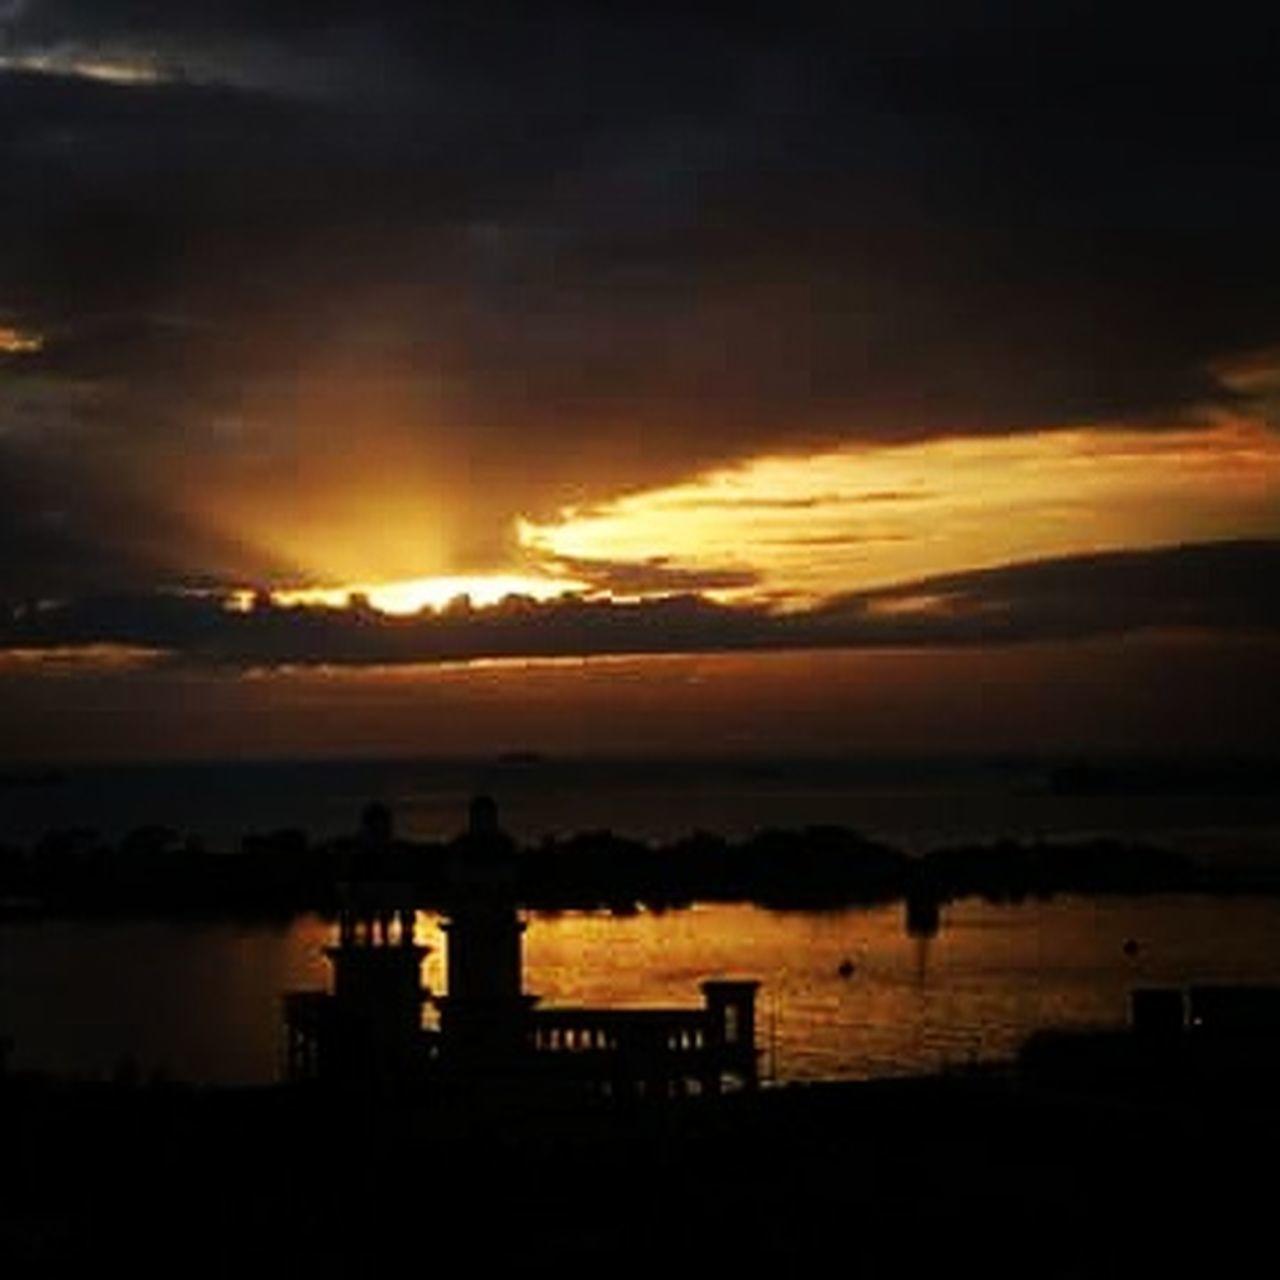 Sunset Sunset_collection Sunset Silhouettes Sunsetporn Beautifull Indonesia Exploreindonesia Wonderful Celebes